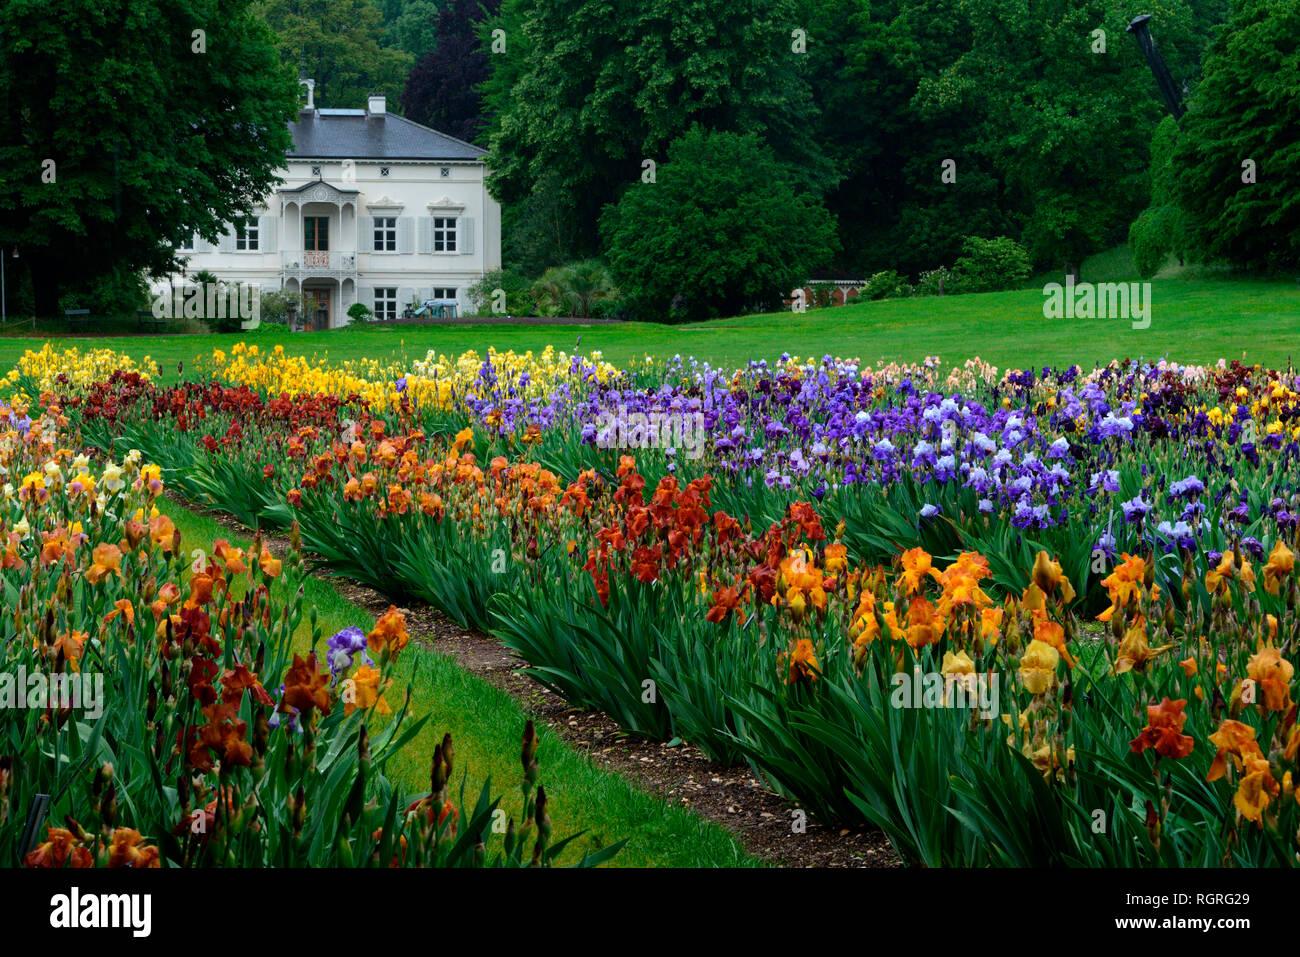 Deutsche Iris, Garten der Villa Merian, Basel, Gruen 80, Schweiz, Europa, Iris x germanica - Stock Image